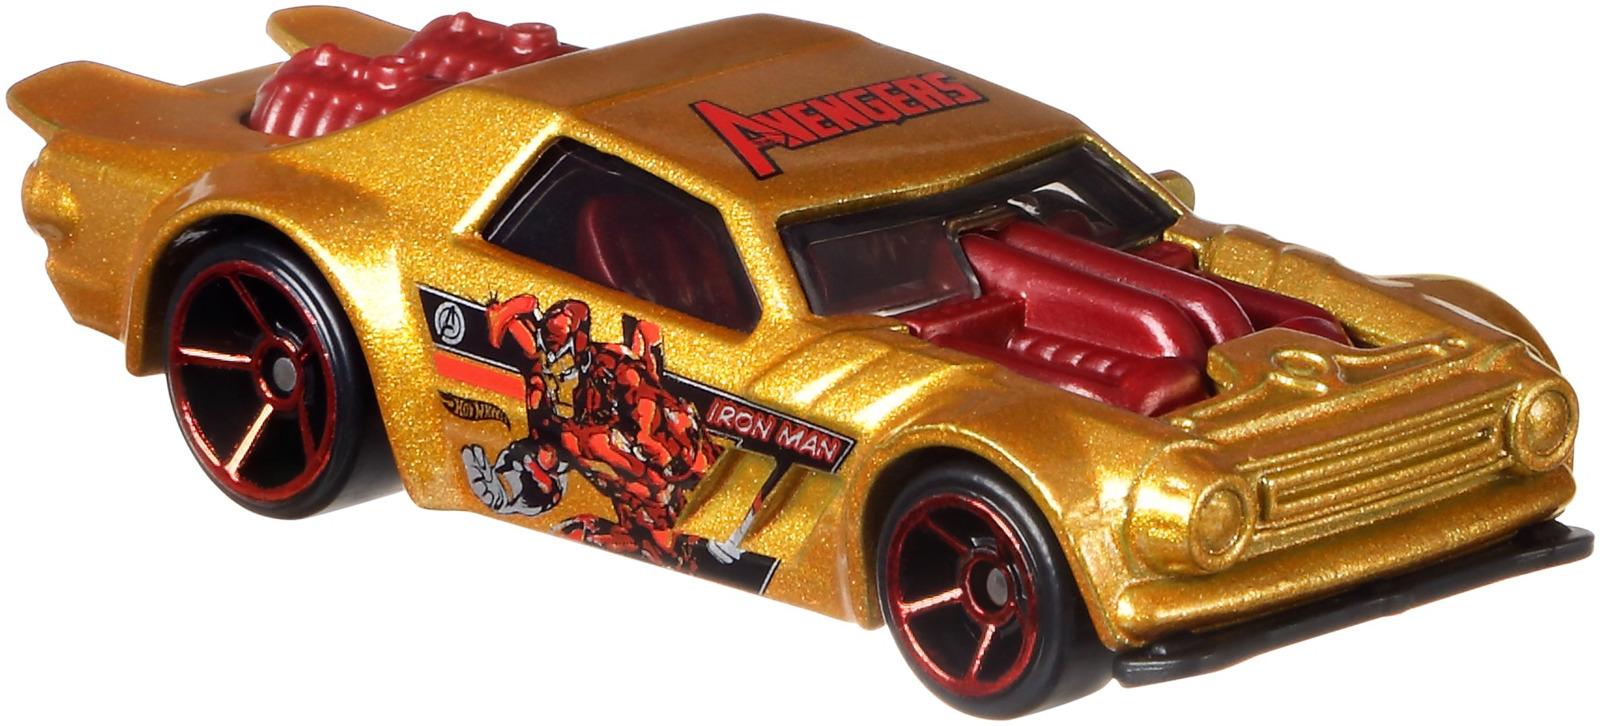 Hot Wheels Трековые машинки Мстители 3 Night Shifter цены онлайн